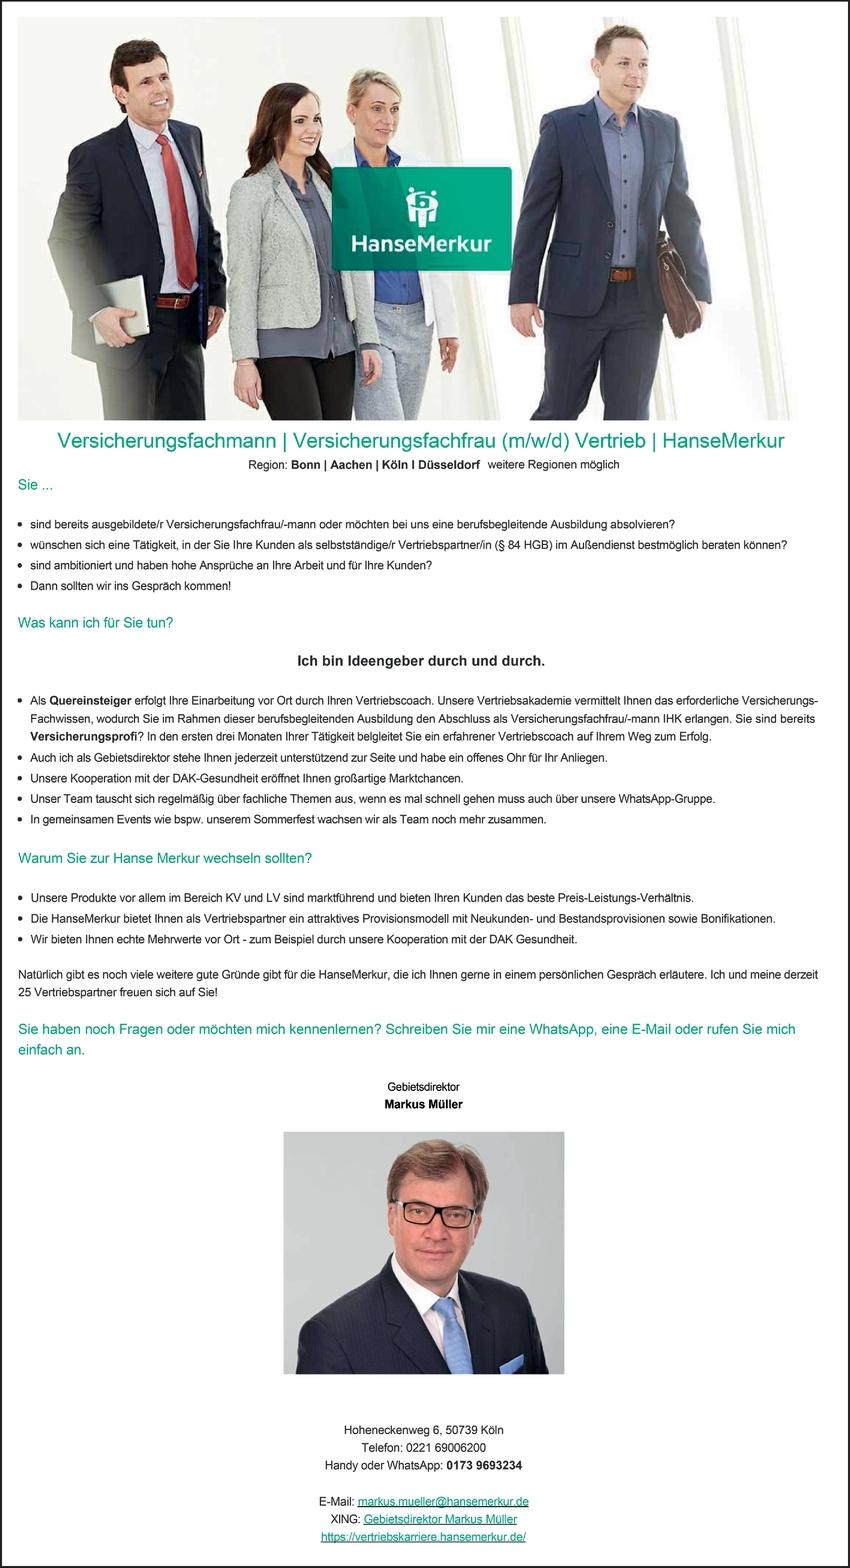 Versicherungsfachmann/-frau